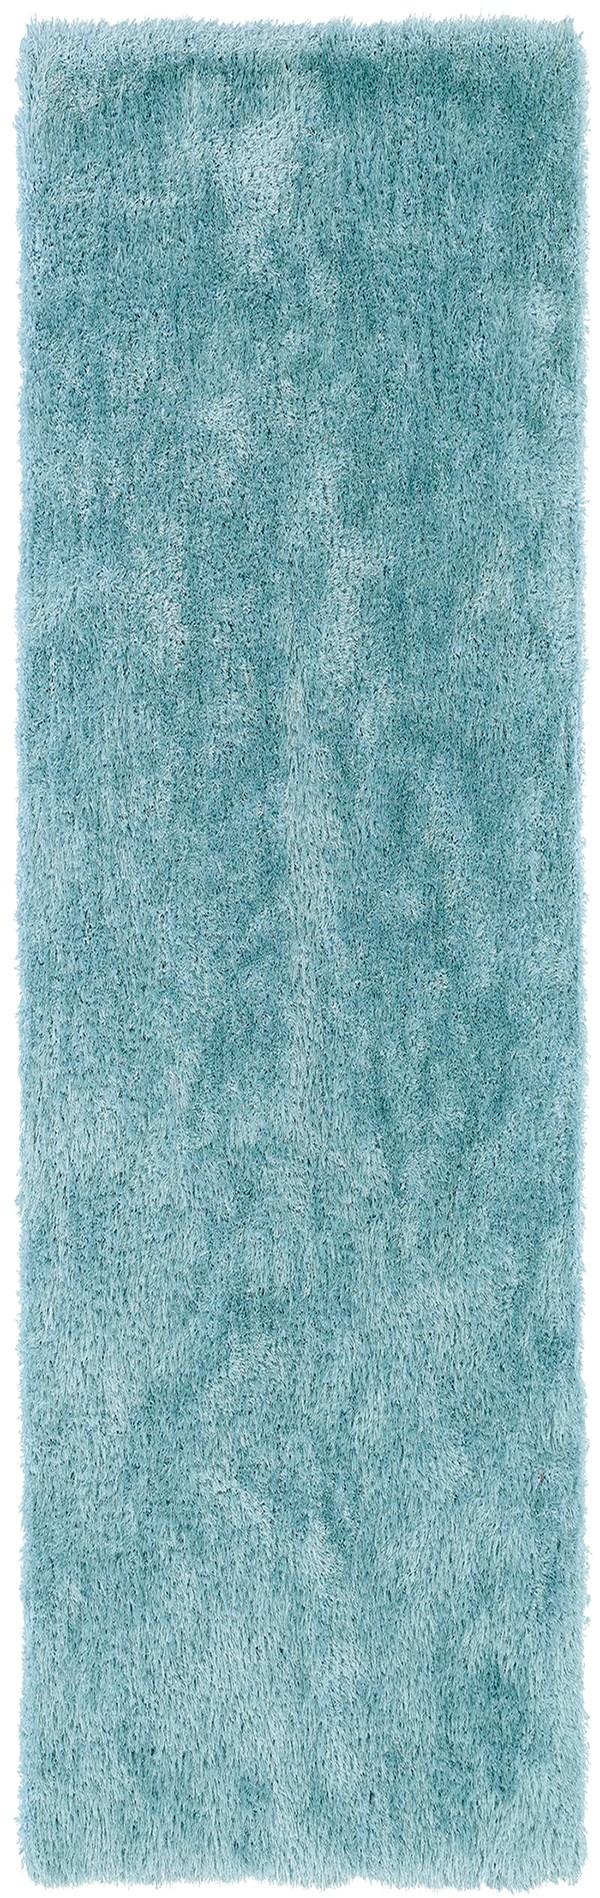 Light Blue (79) Solid Area Rug